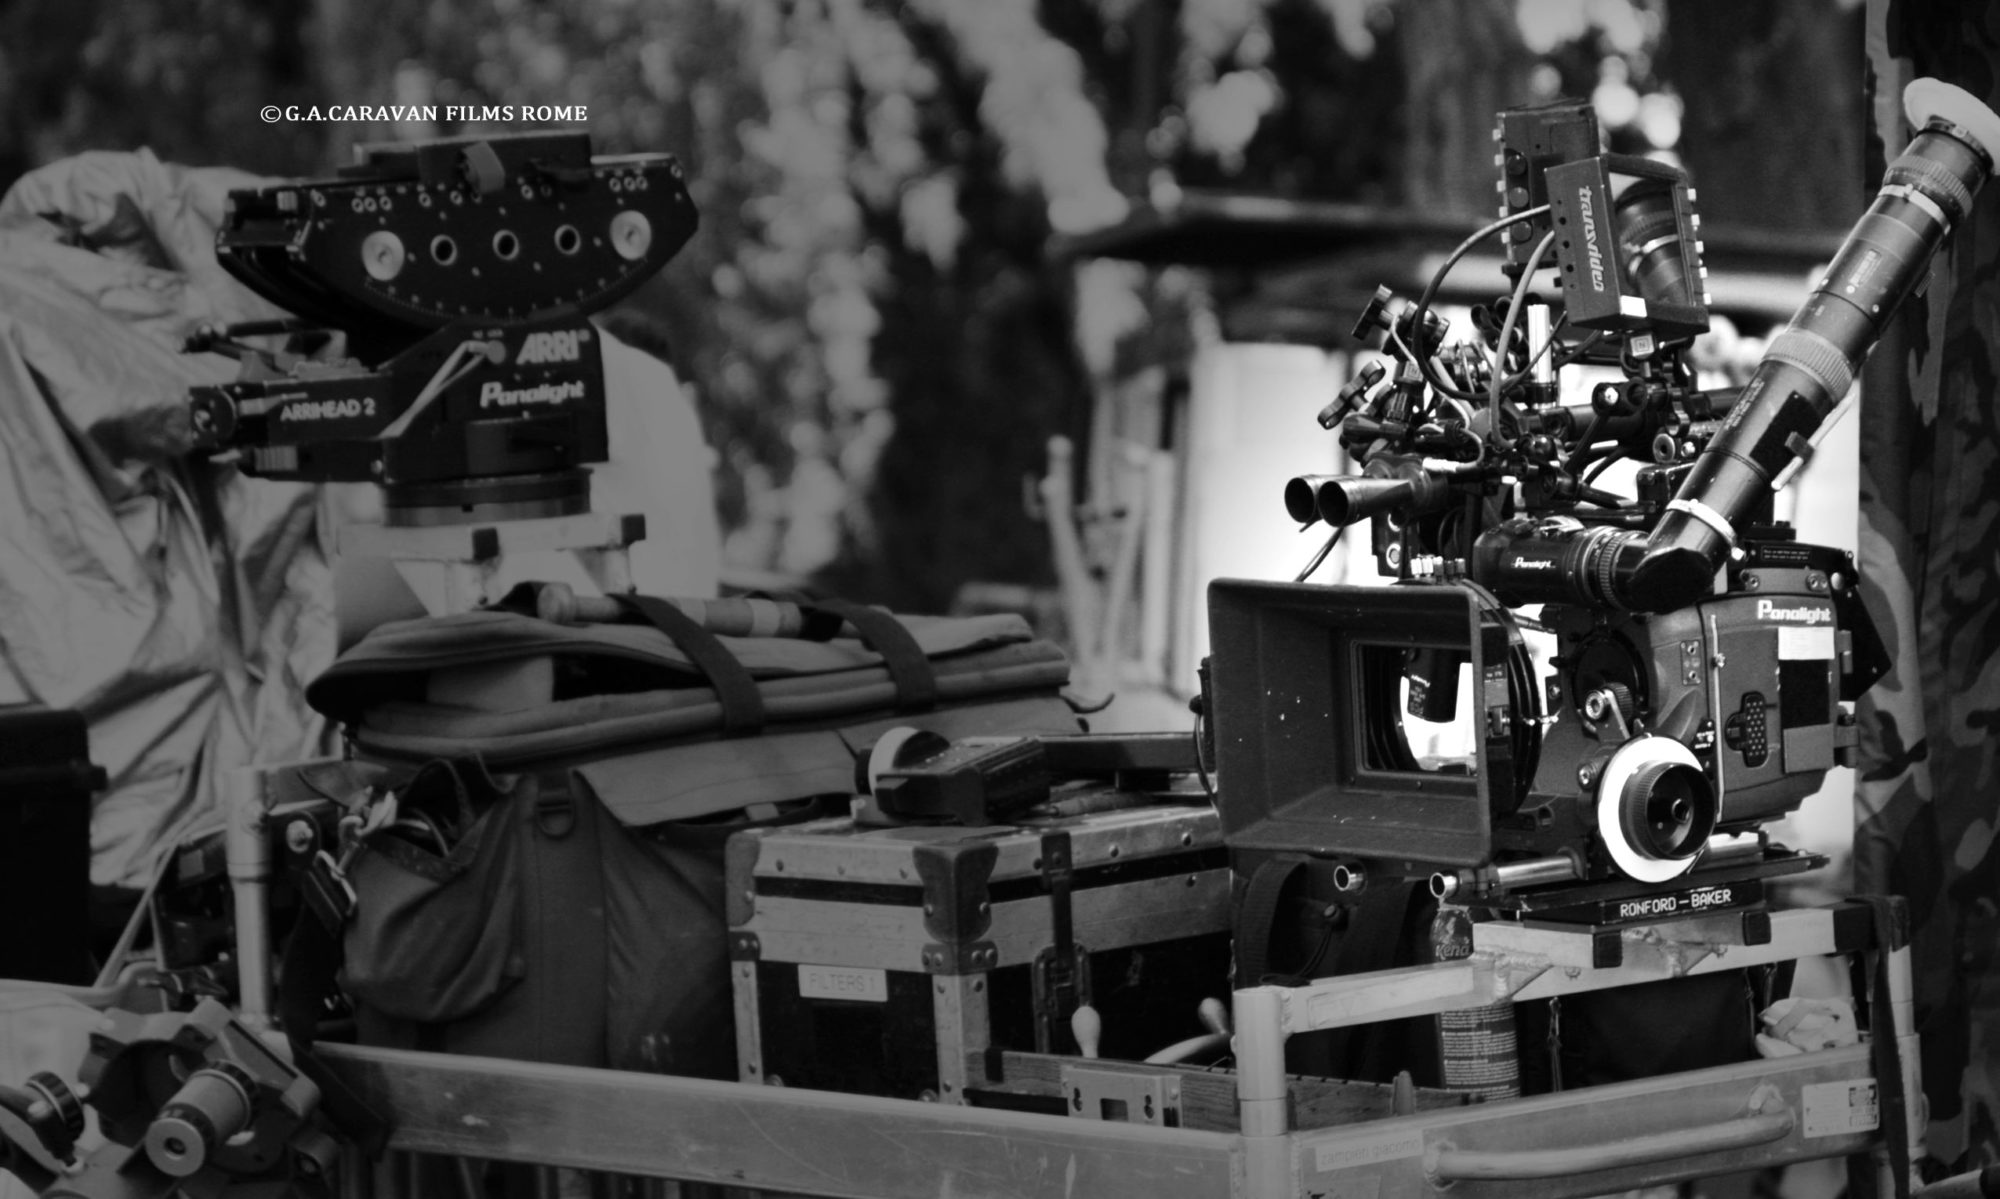 G.A. Caravan Films Rome